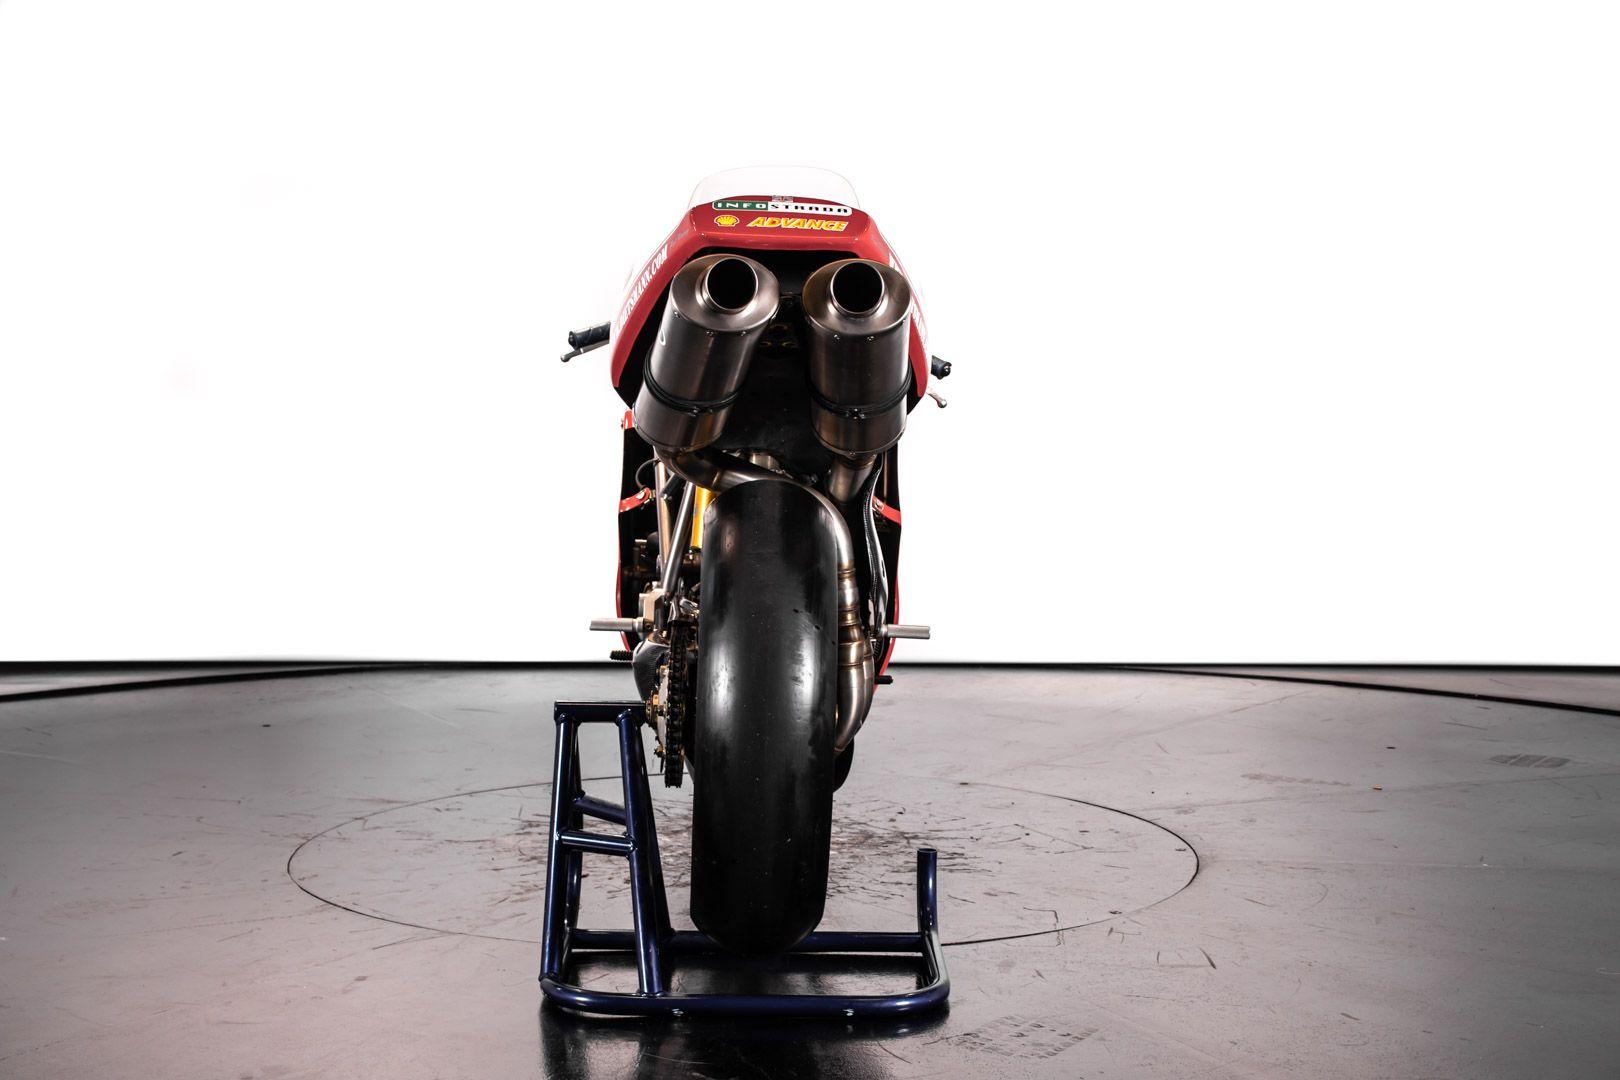 2008 Ducati 996 Fogarty Evocation 03/12 84208